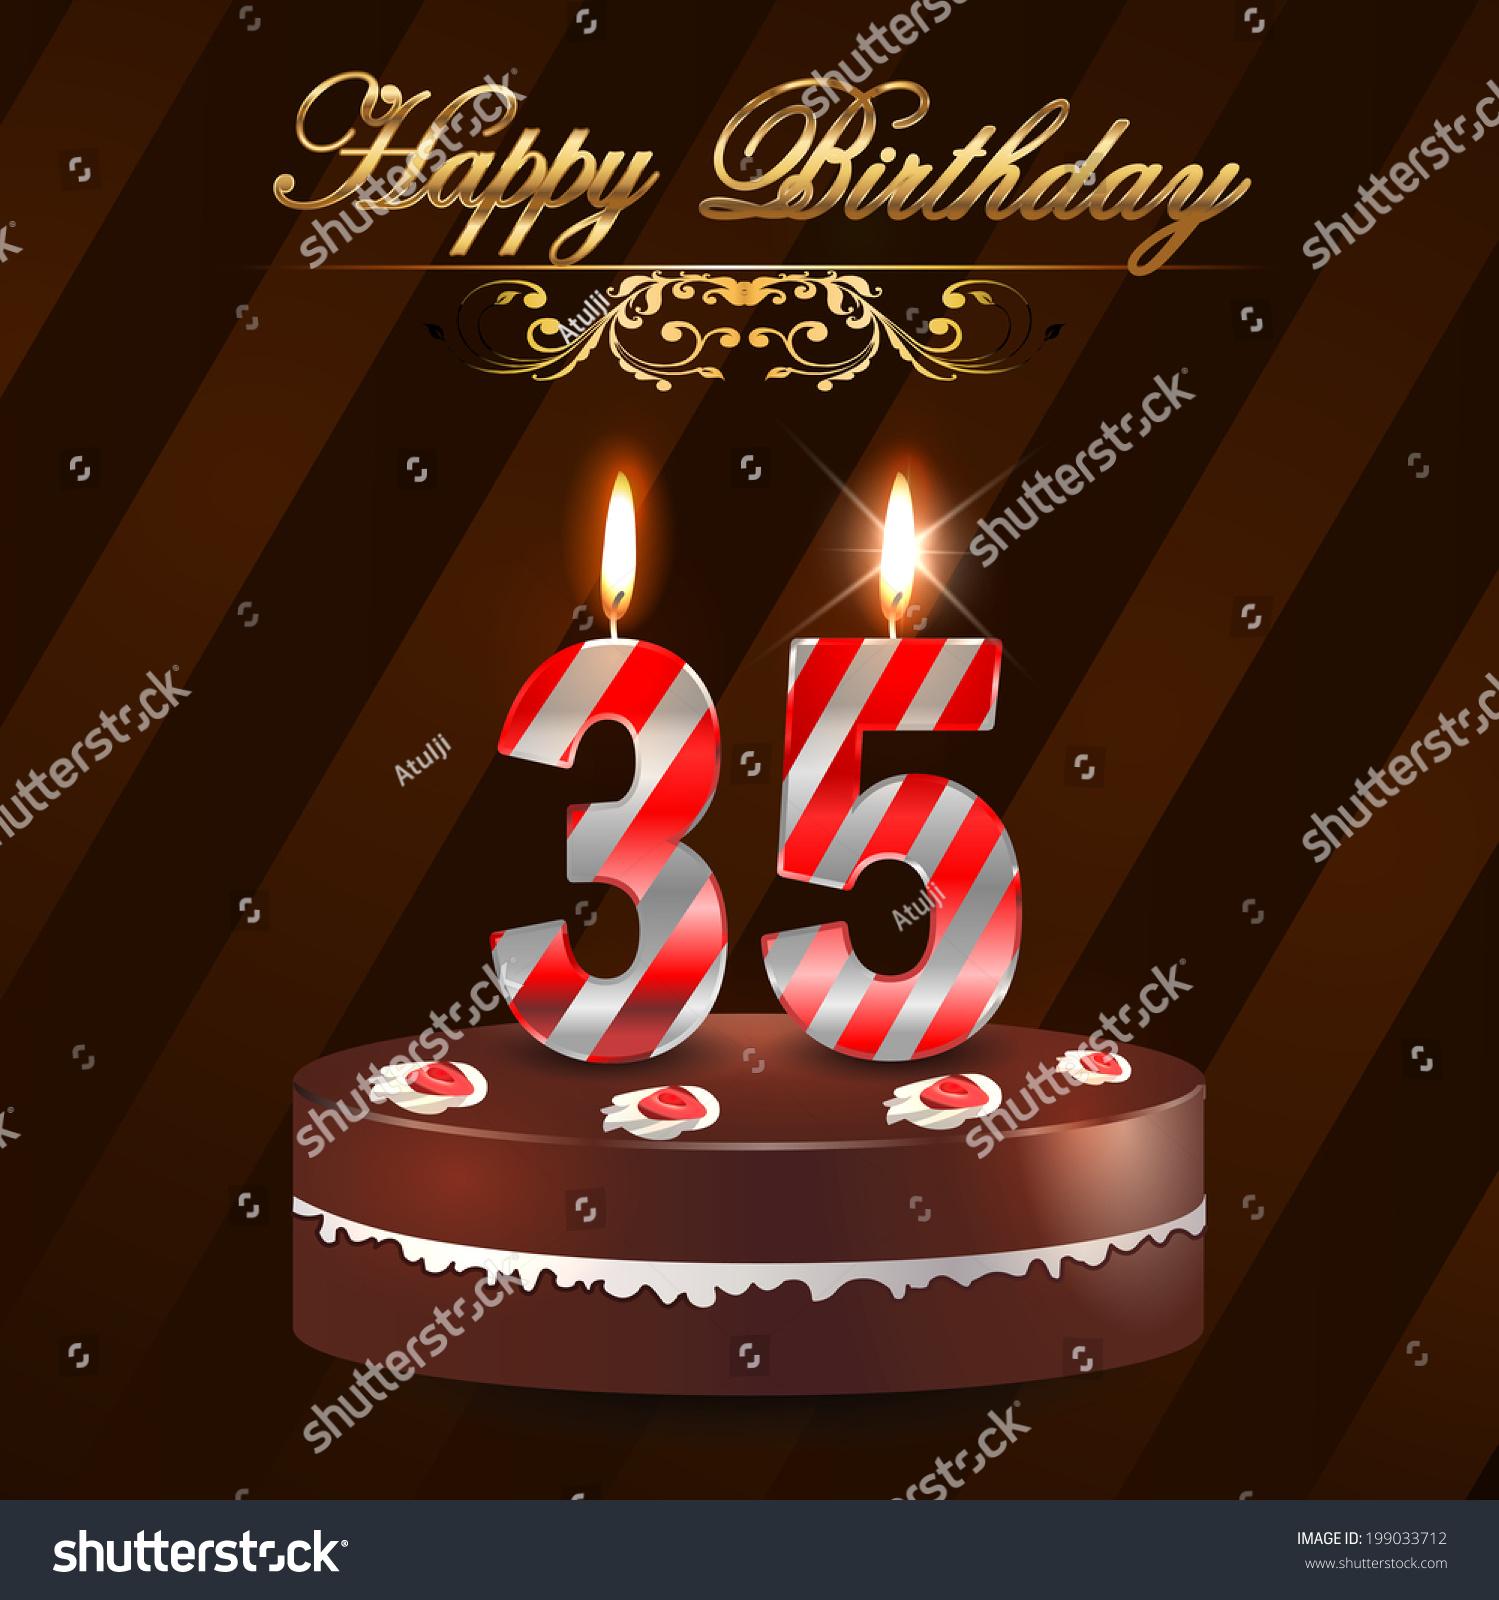 Peachy 35 Year Happy Birthday Card Cake Stock Vector Royalty Free 199033712 Personalised Birthday Cards Sponlily Jamesorg